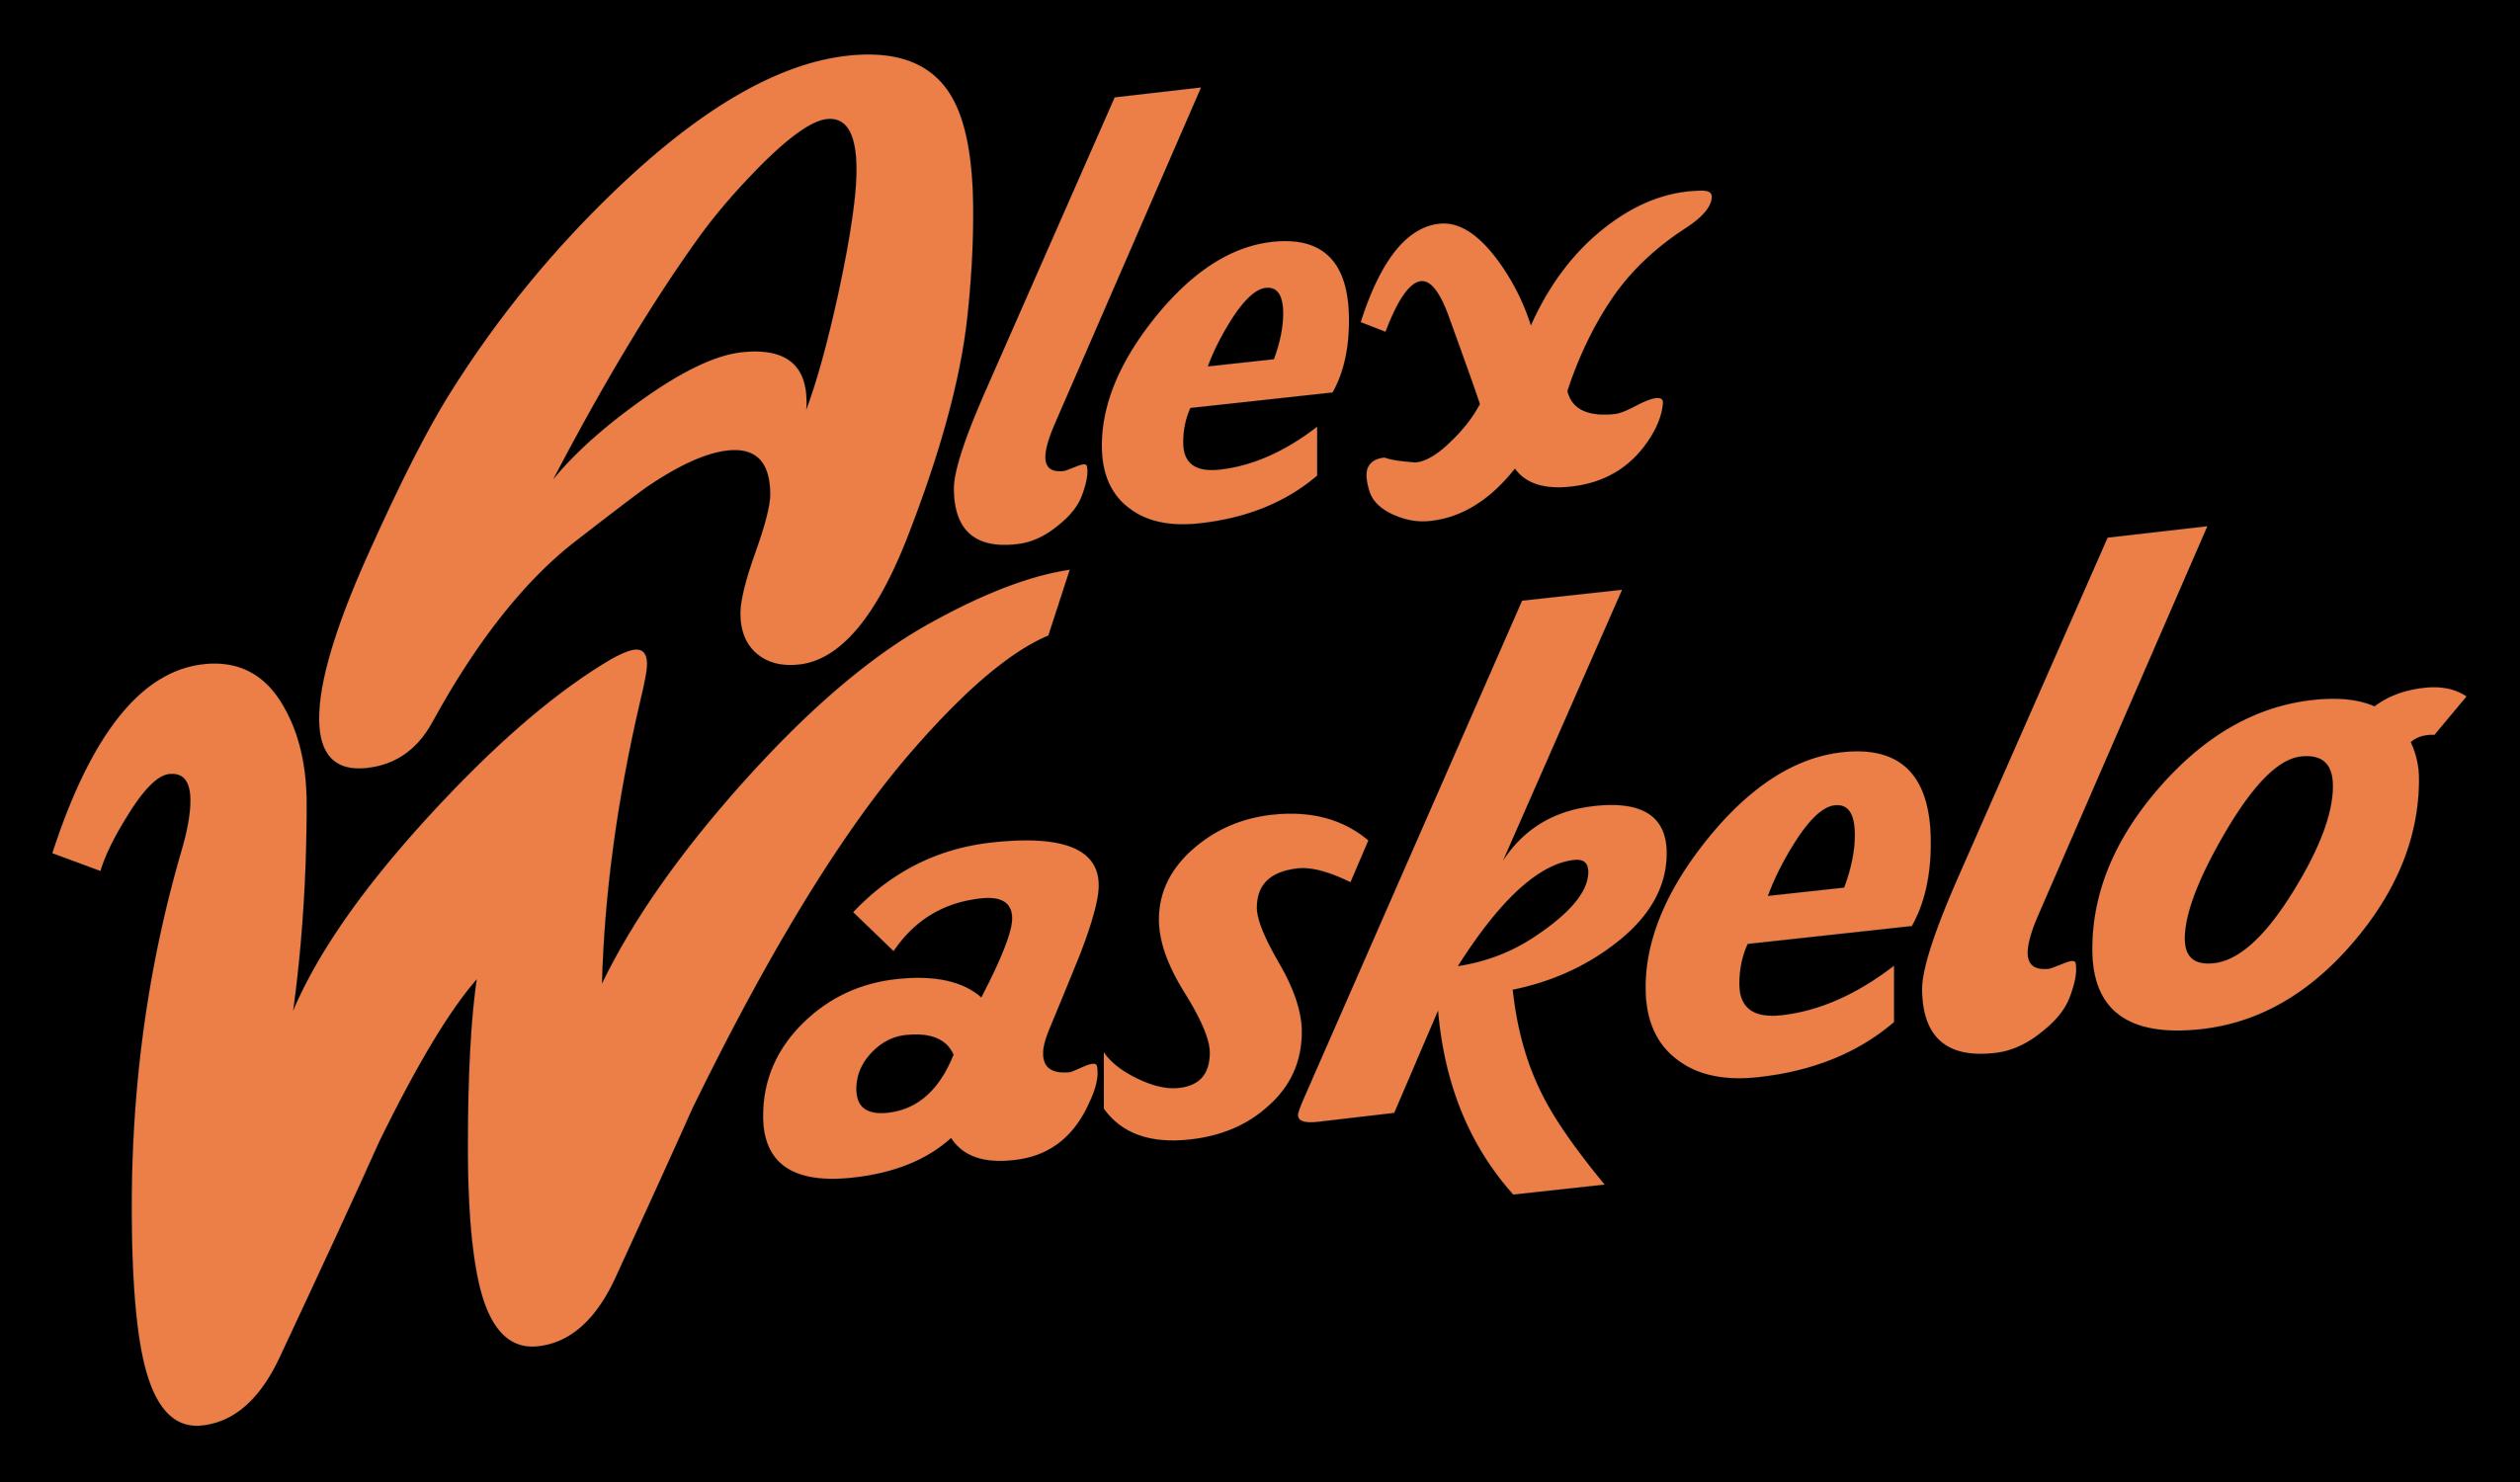 Alex Waskelo